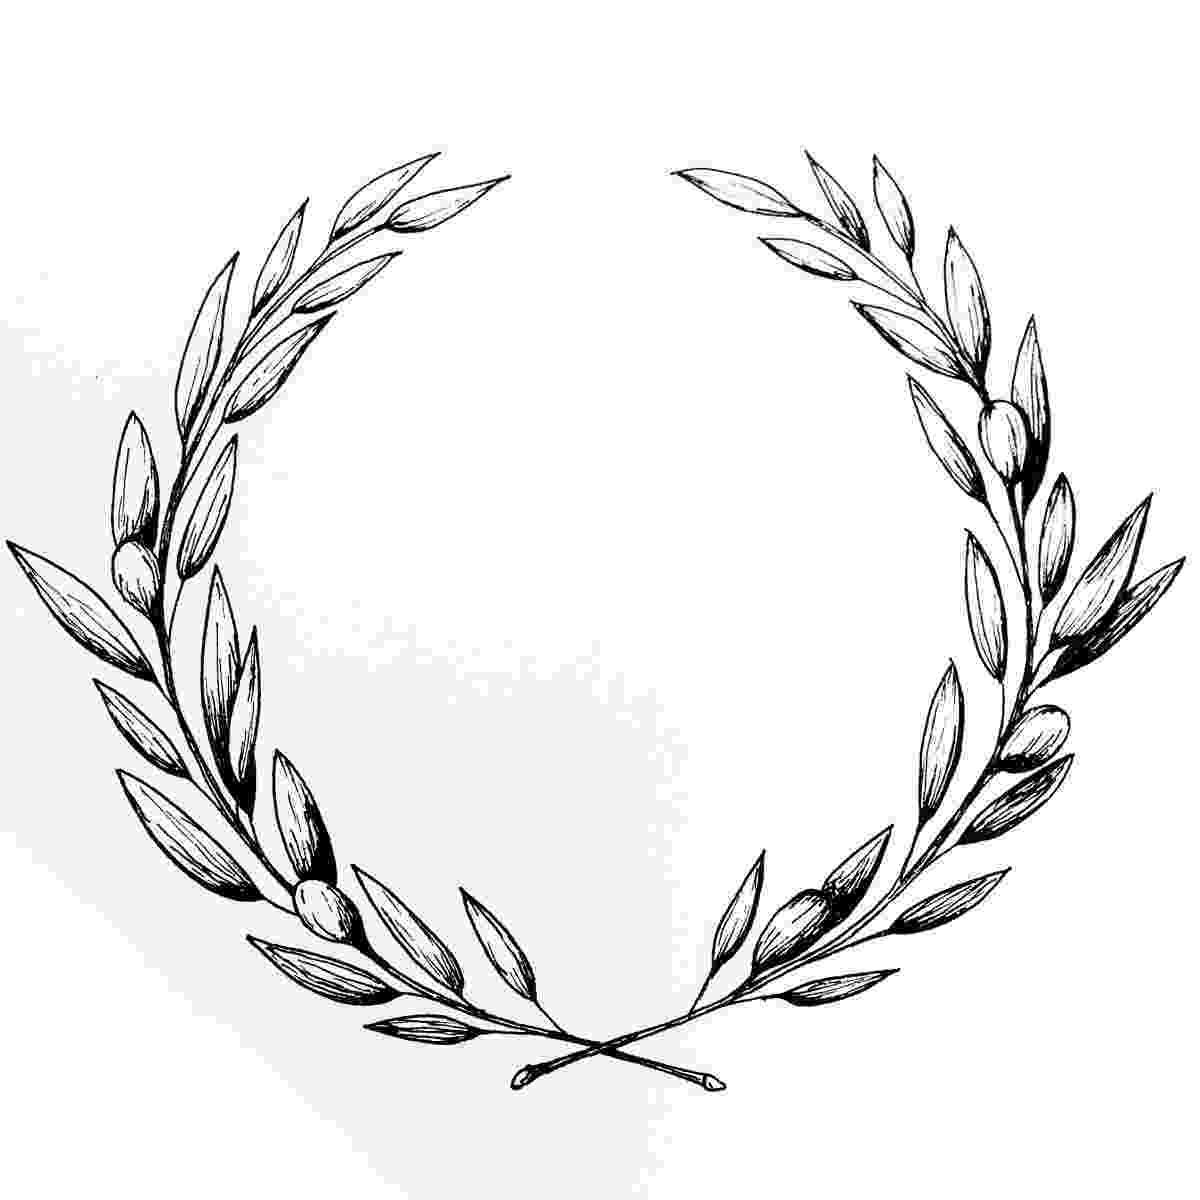 olive branch sketch olive wreath illustration amy rochelle press sketch olive branch